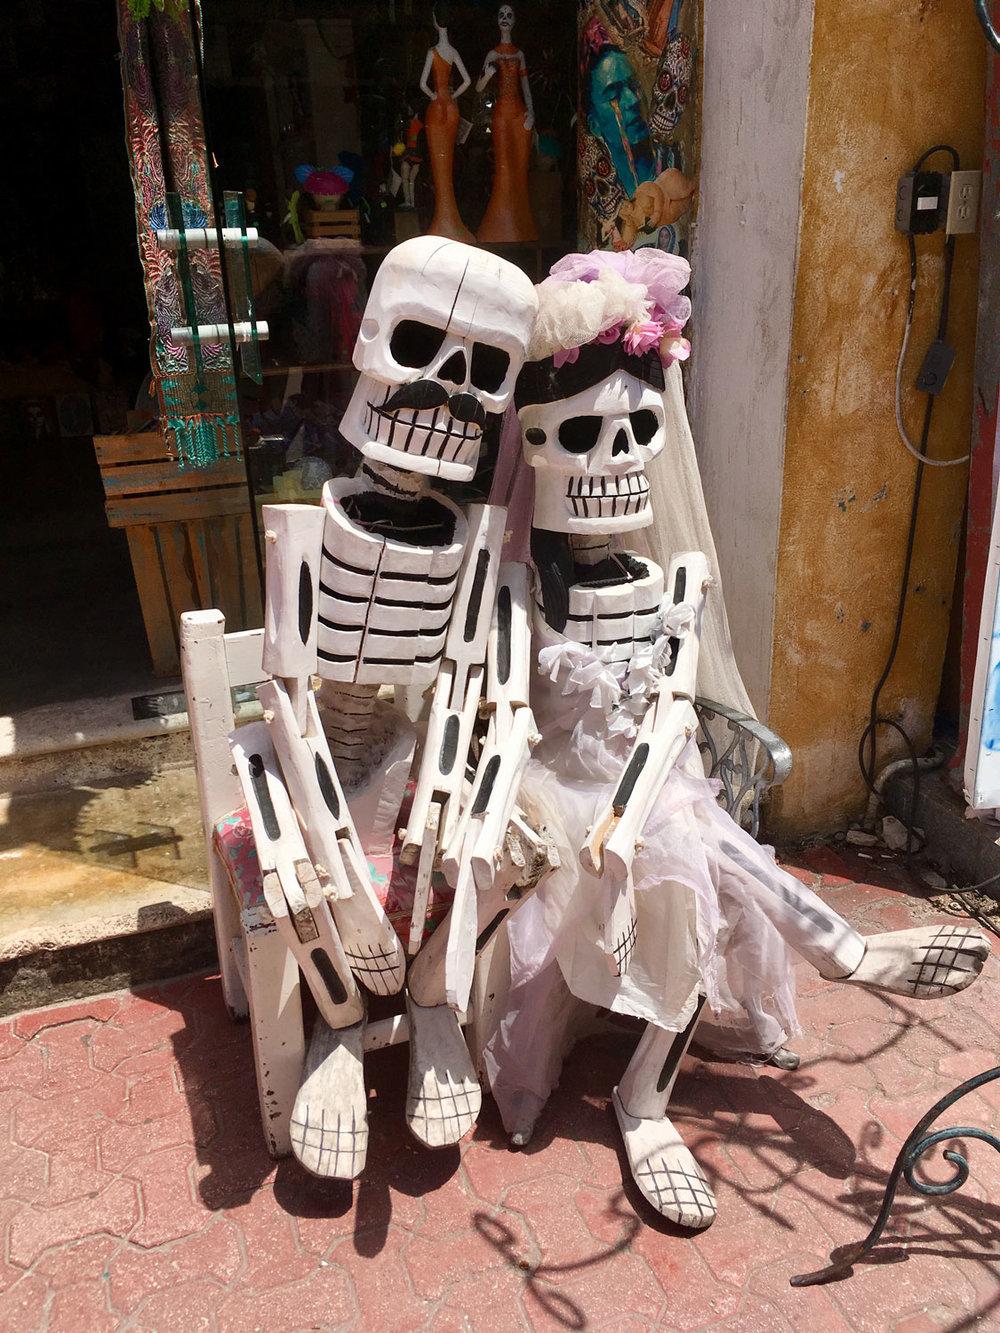 Hammocks_and_Ruins_Blog_Riviera_Maya_Mexico_Travel_Discover_Explore_What_to_do_Playa_del_Carmen_12.jpg